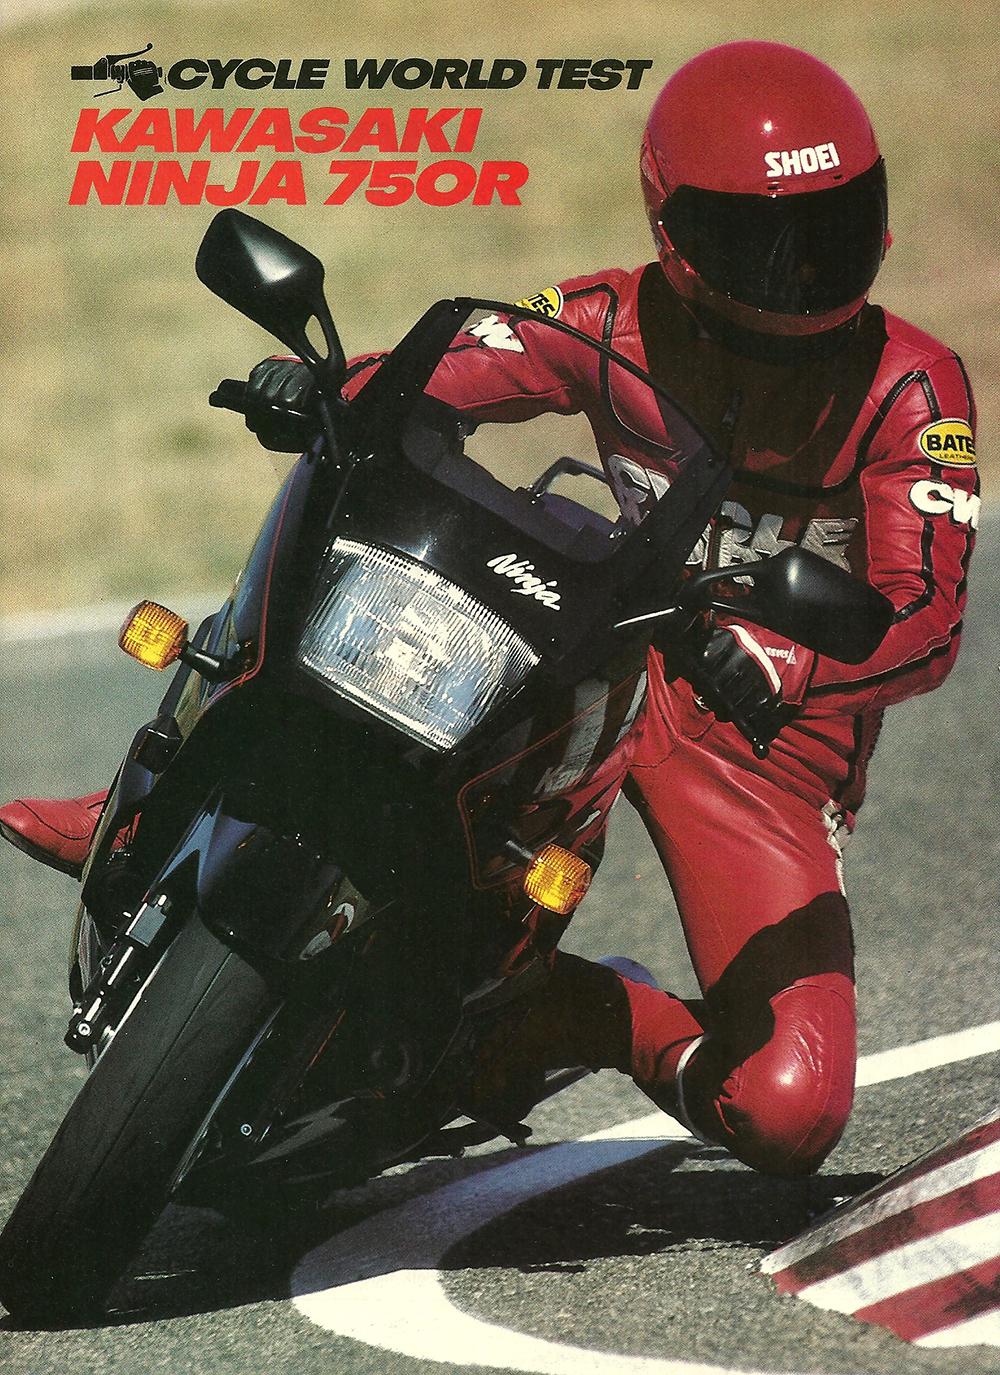 1986 Kawasaki Ninja 750R road test 01.jpg